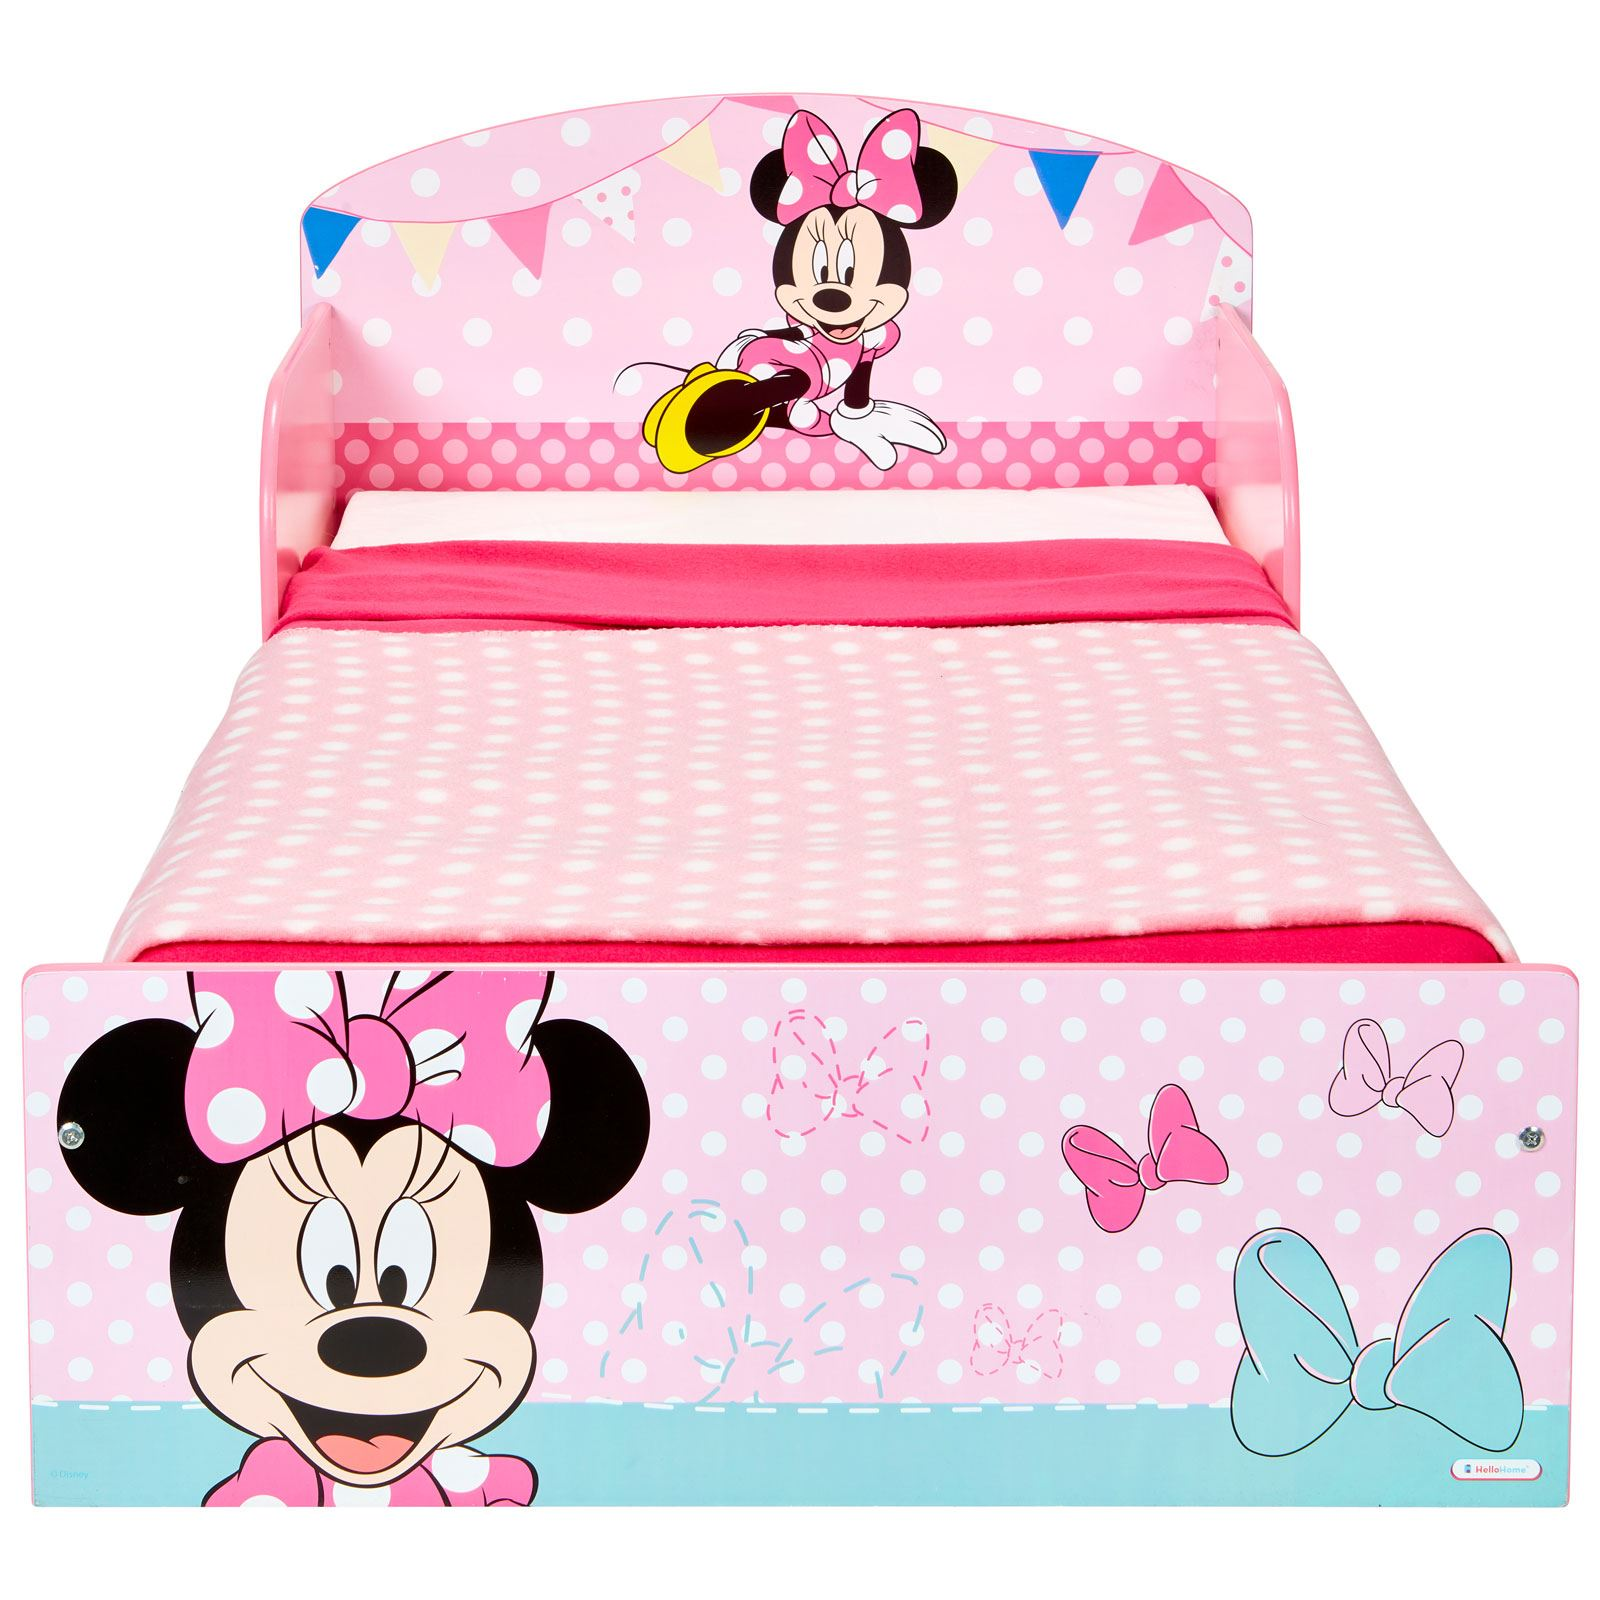 miniatura 24 - KIDS CHARACTER TODDLER BEDS - BOYS GIRLS BEDROOM DISNEY